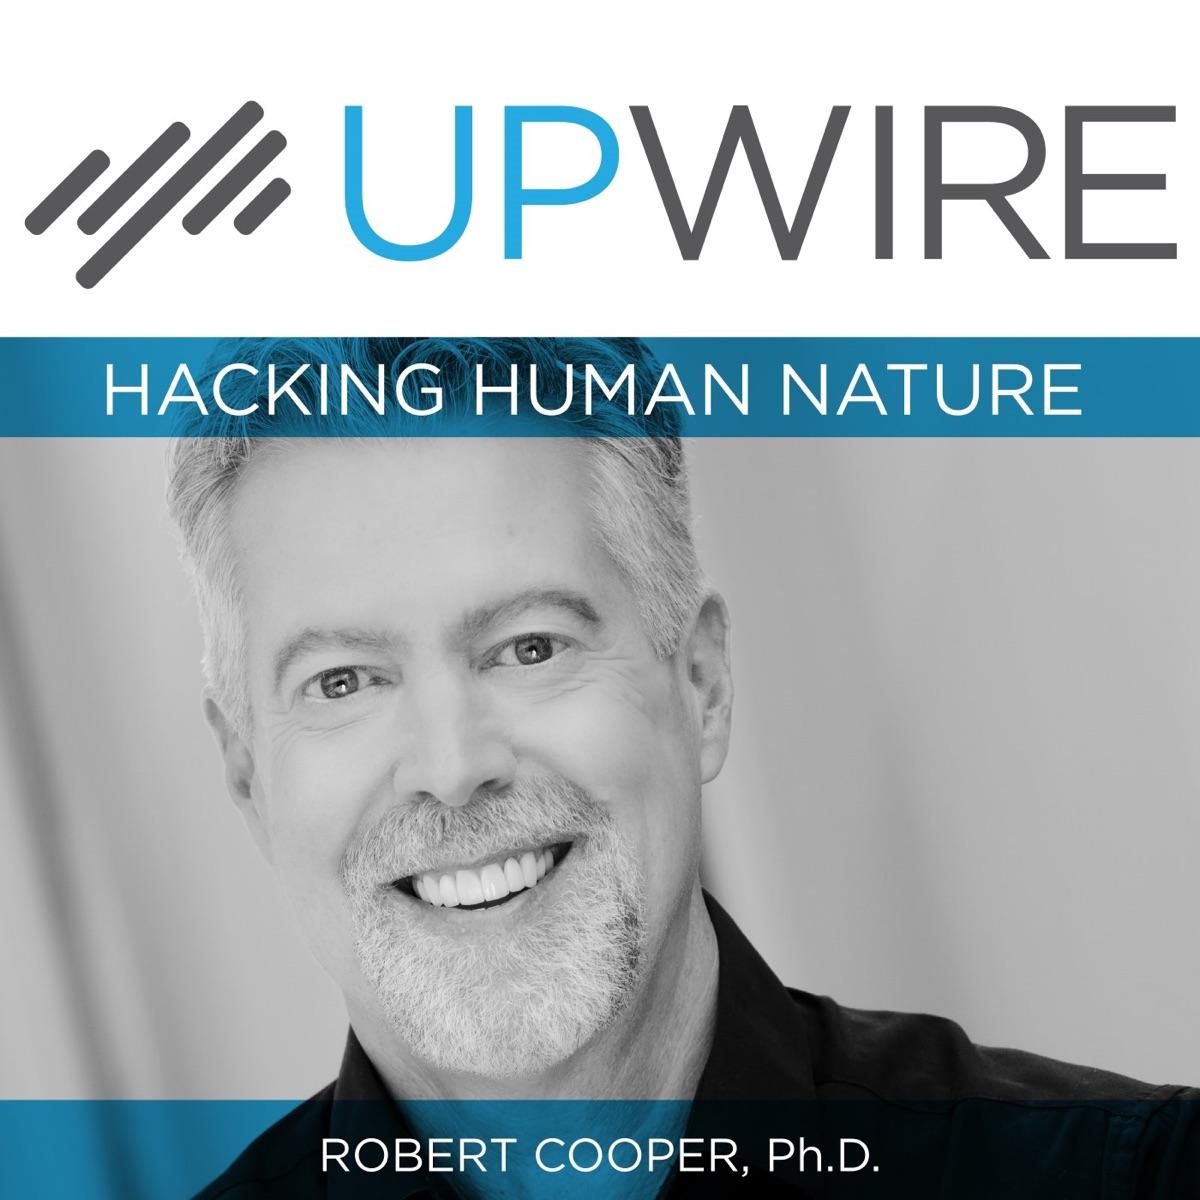 UPWIRE: Hacking Human Nature